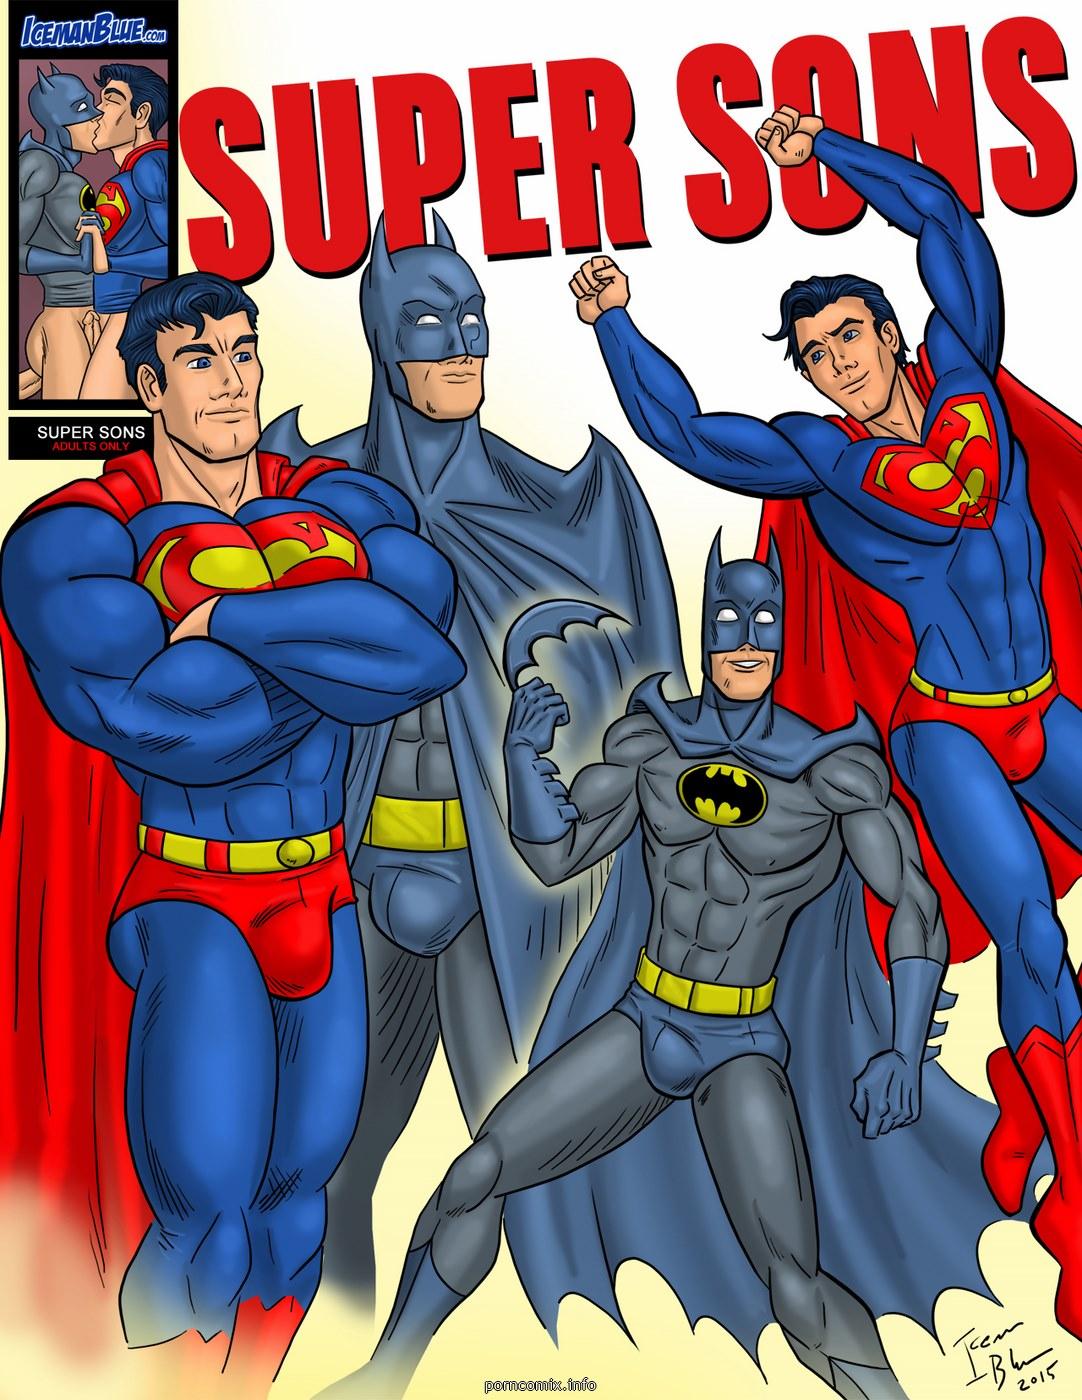 [Iceman Blue] Super Sons image 01